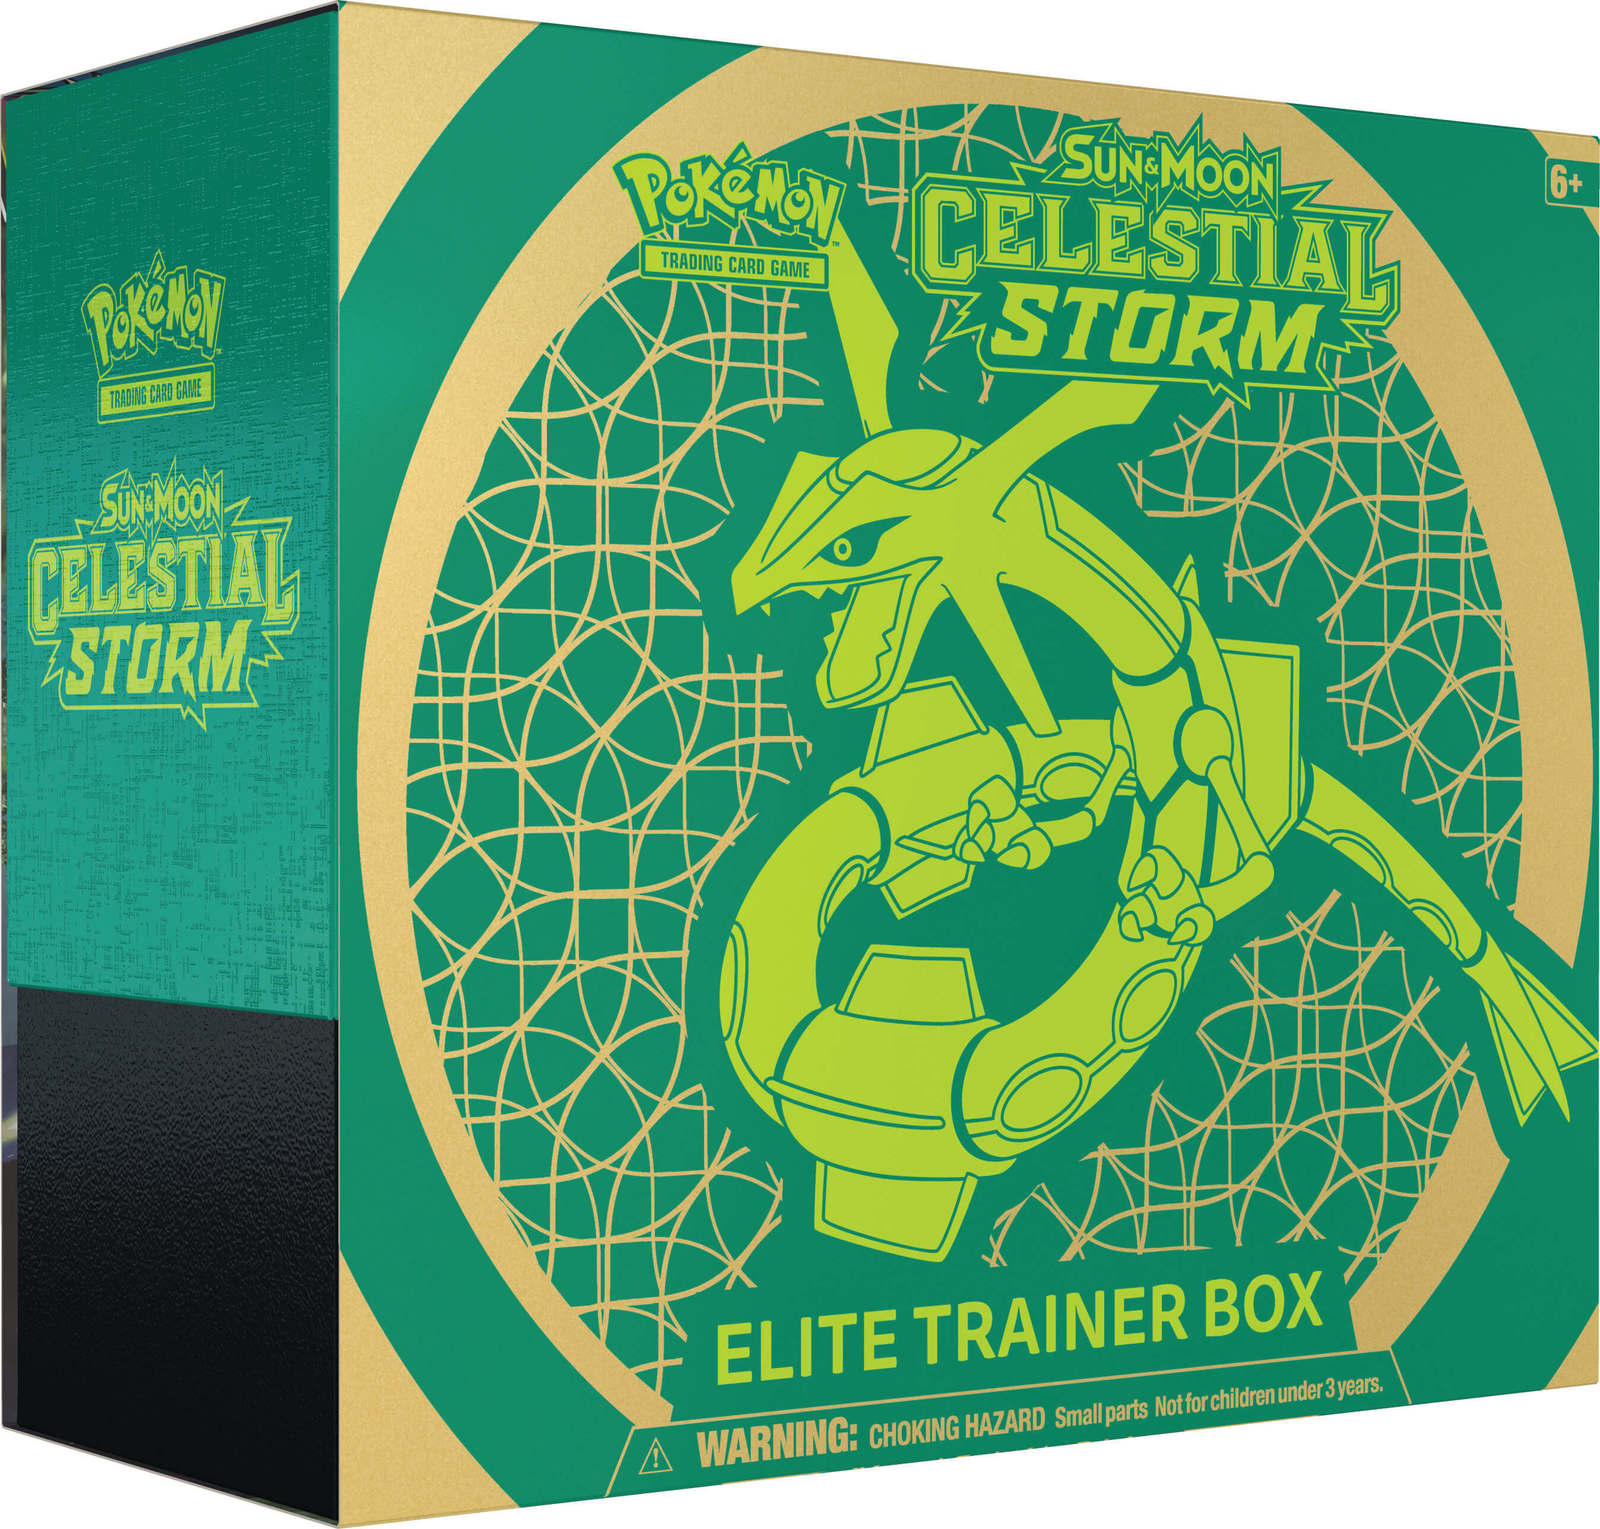 Pokemon TCG: Celestial Storm - Trainer Box image